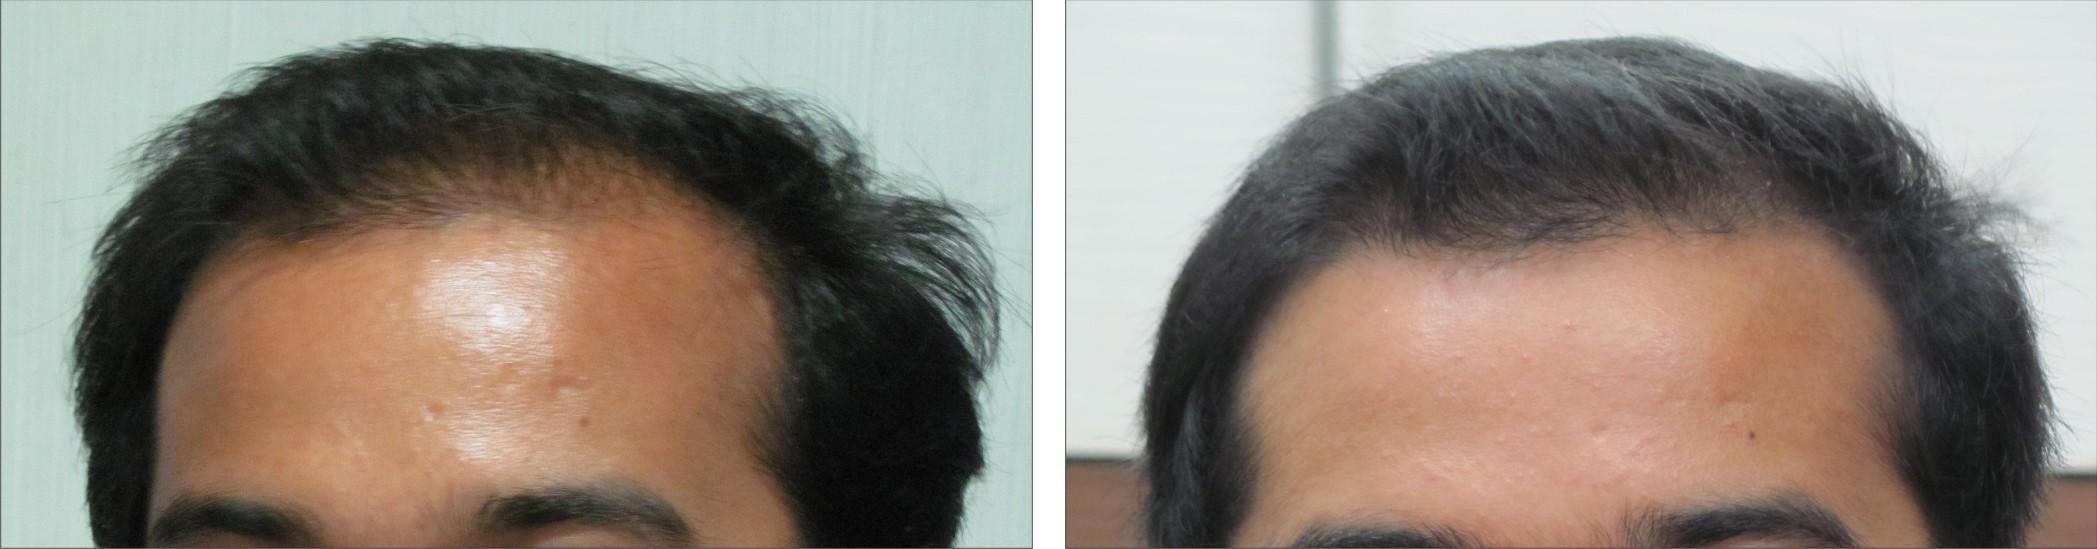 Derma Roller Image Three